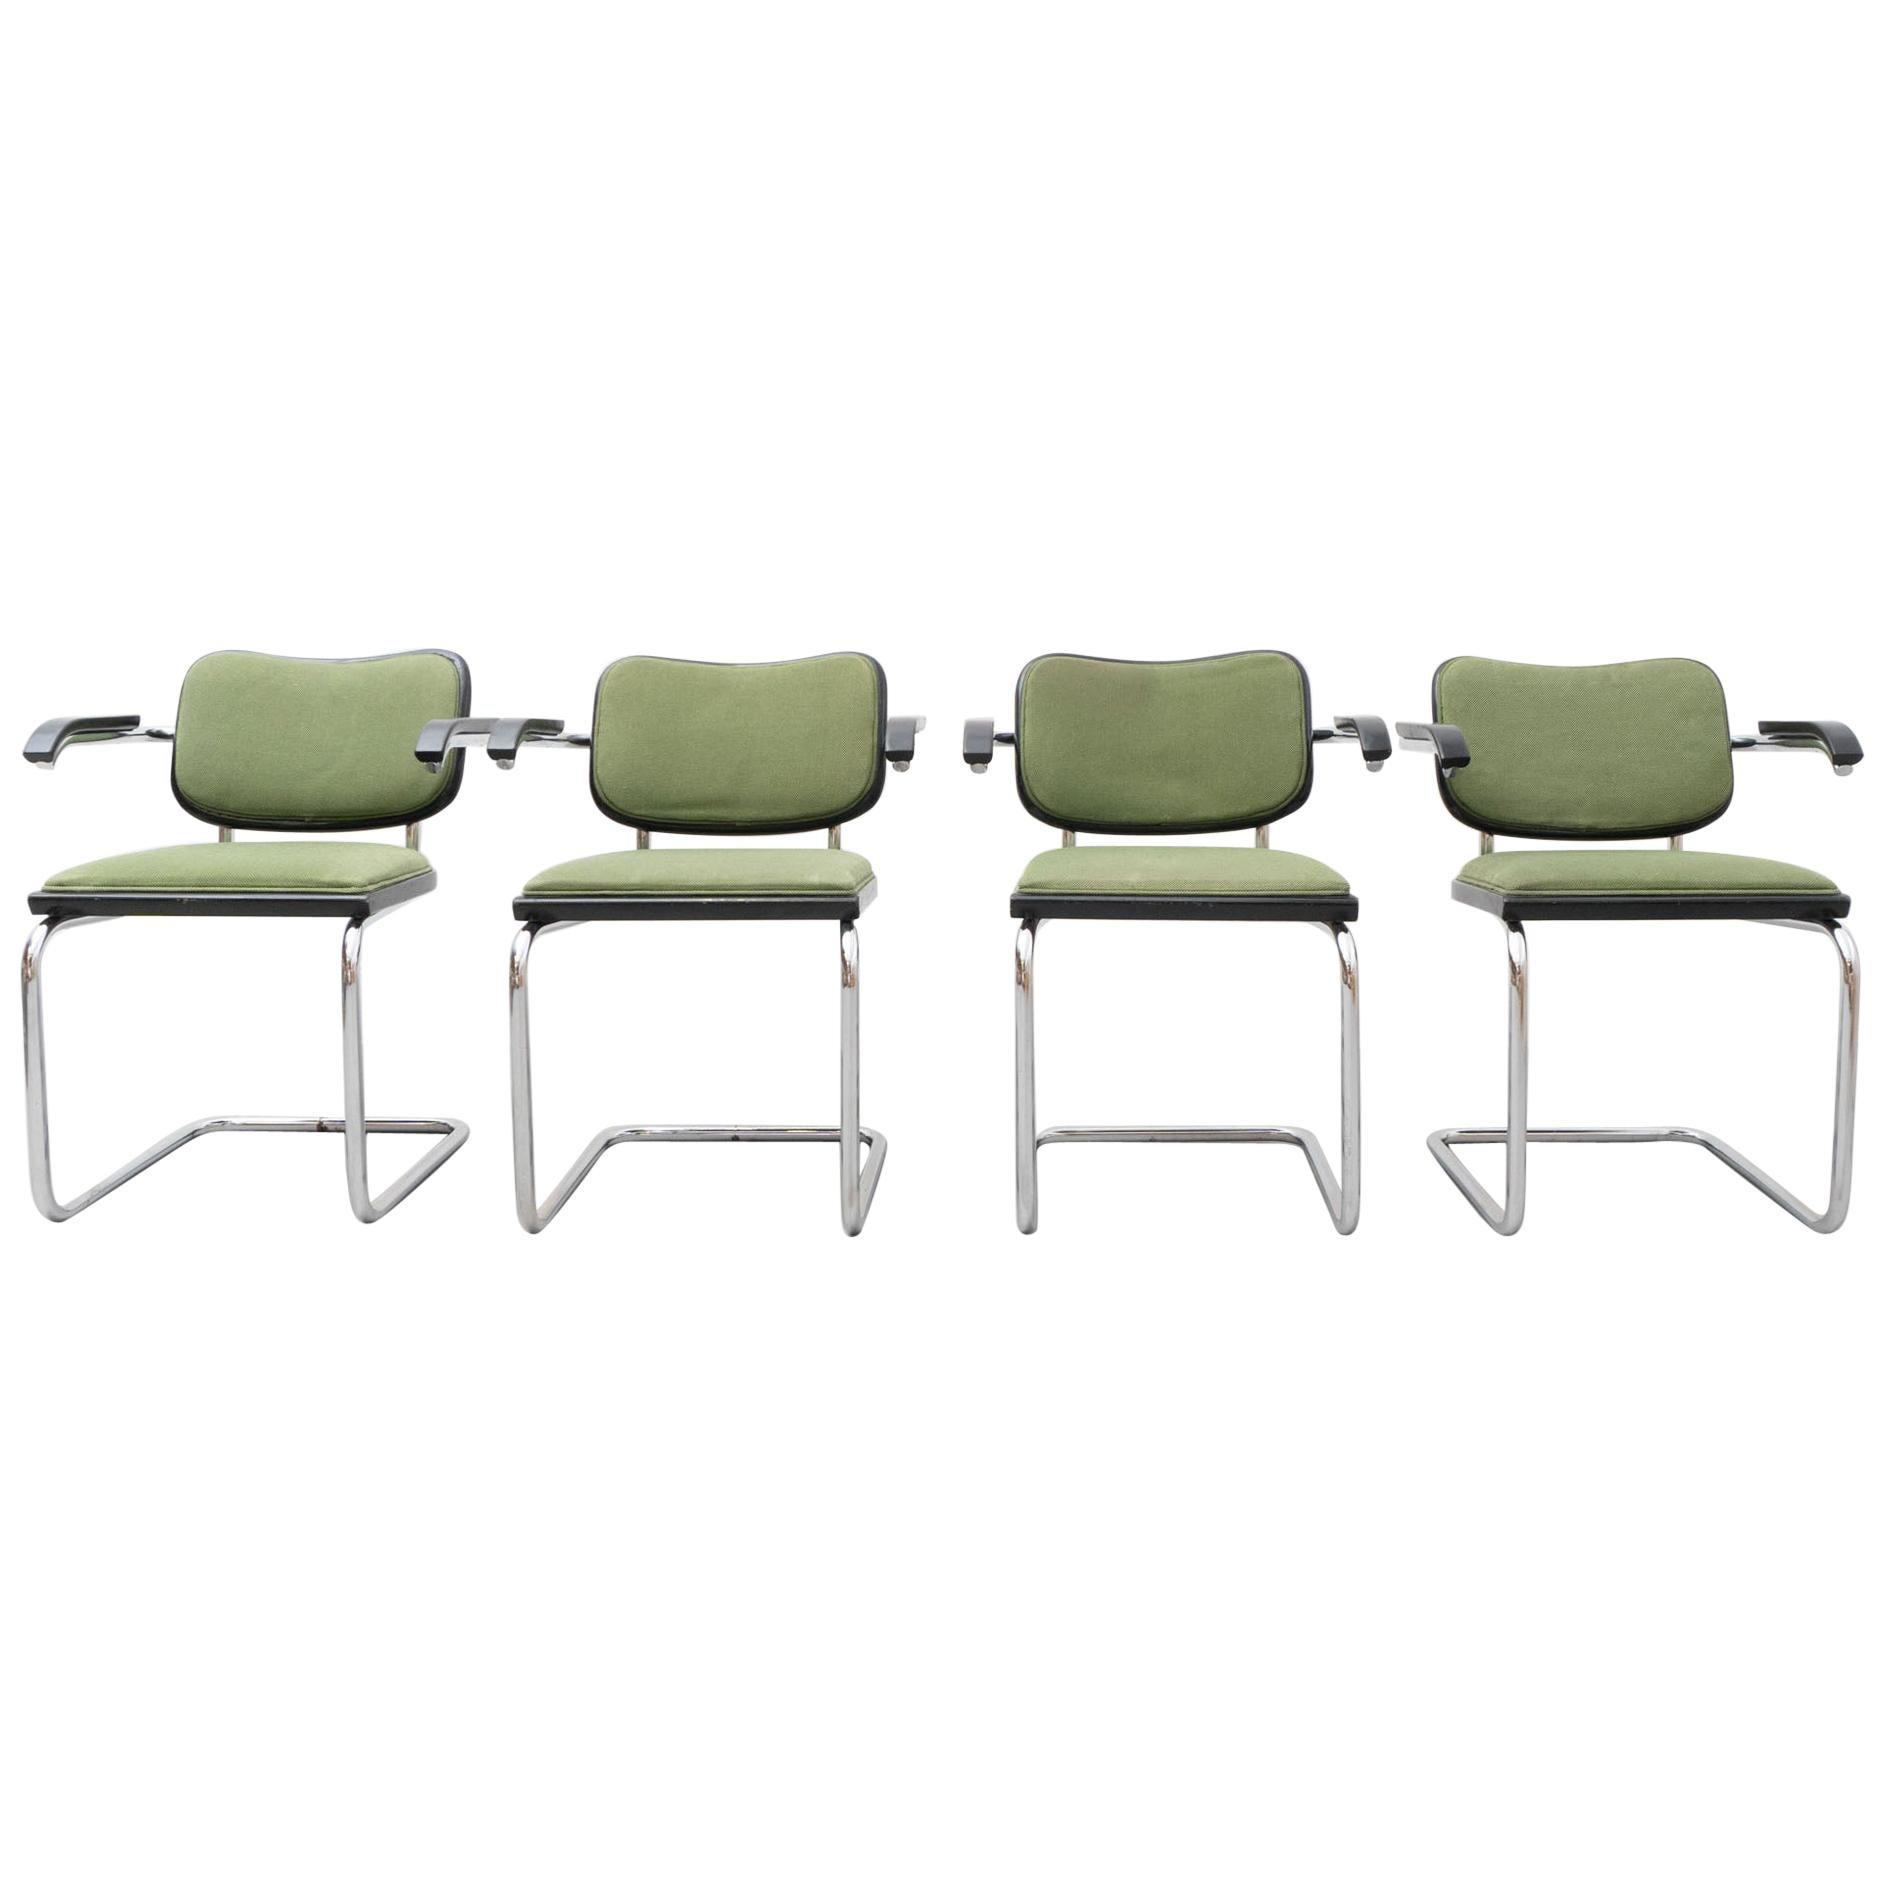 Set of Four Marcel Breuer Cesca Chairs by Gavina, circa 1970